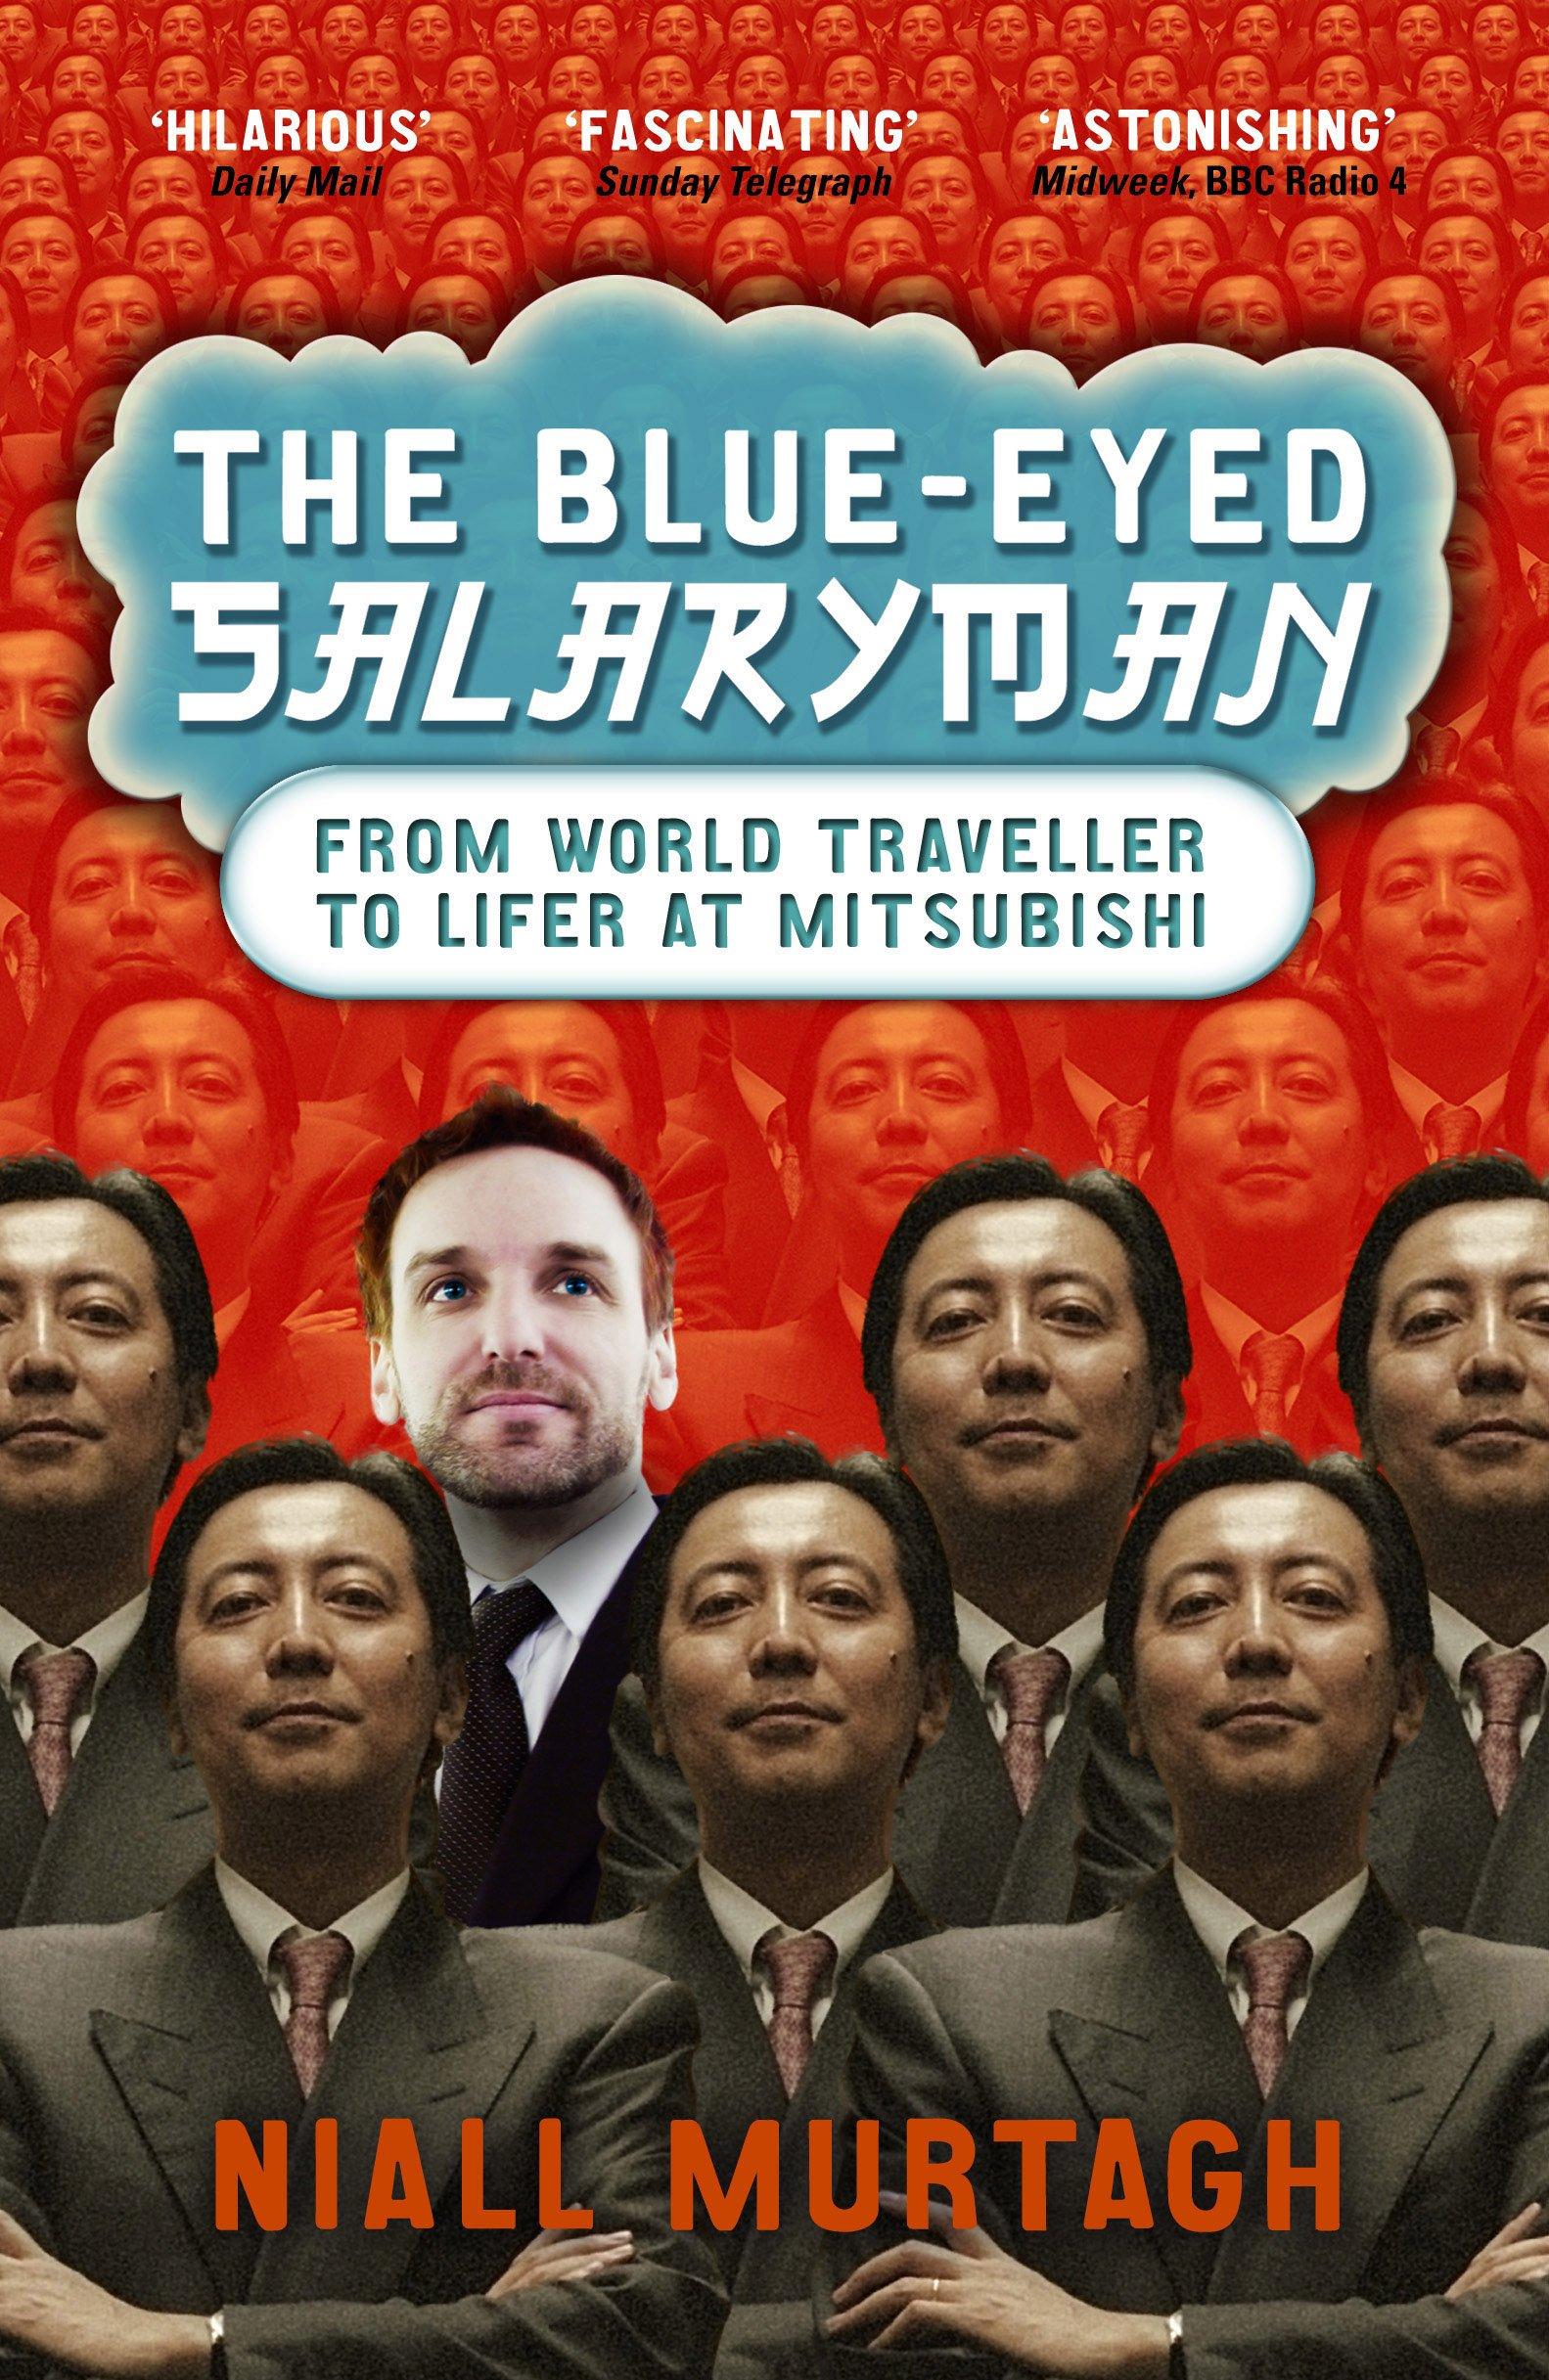 The Blue-Eyed Salaryman: From World Traveller to Lifer at Mitsubishi